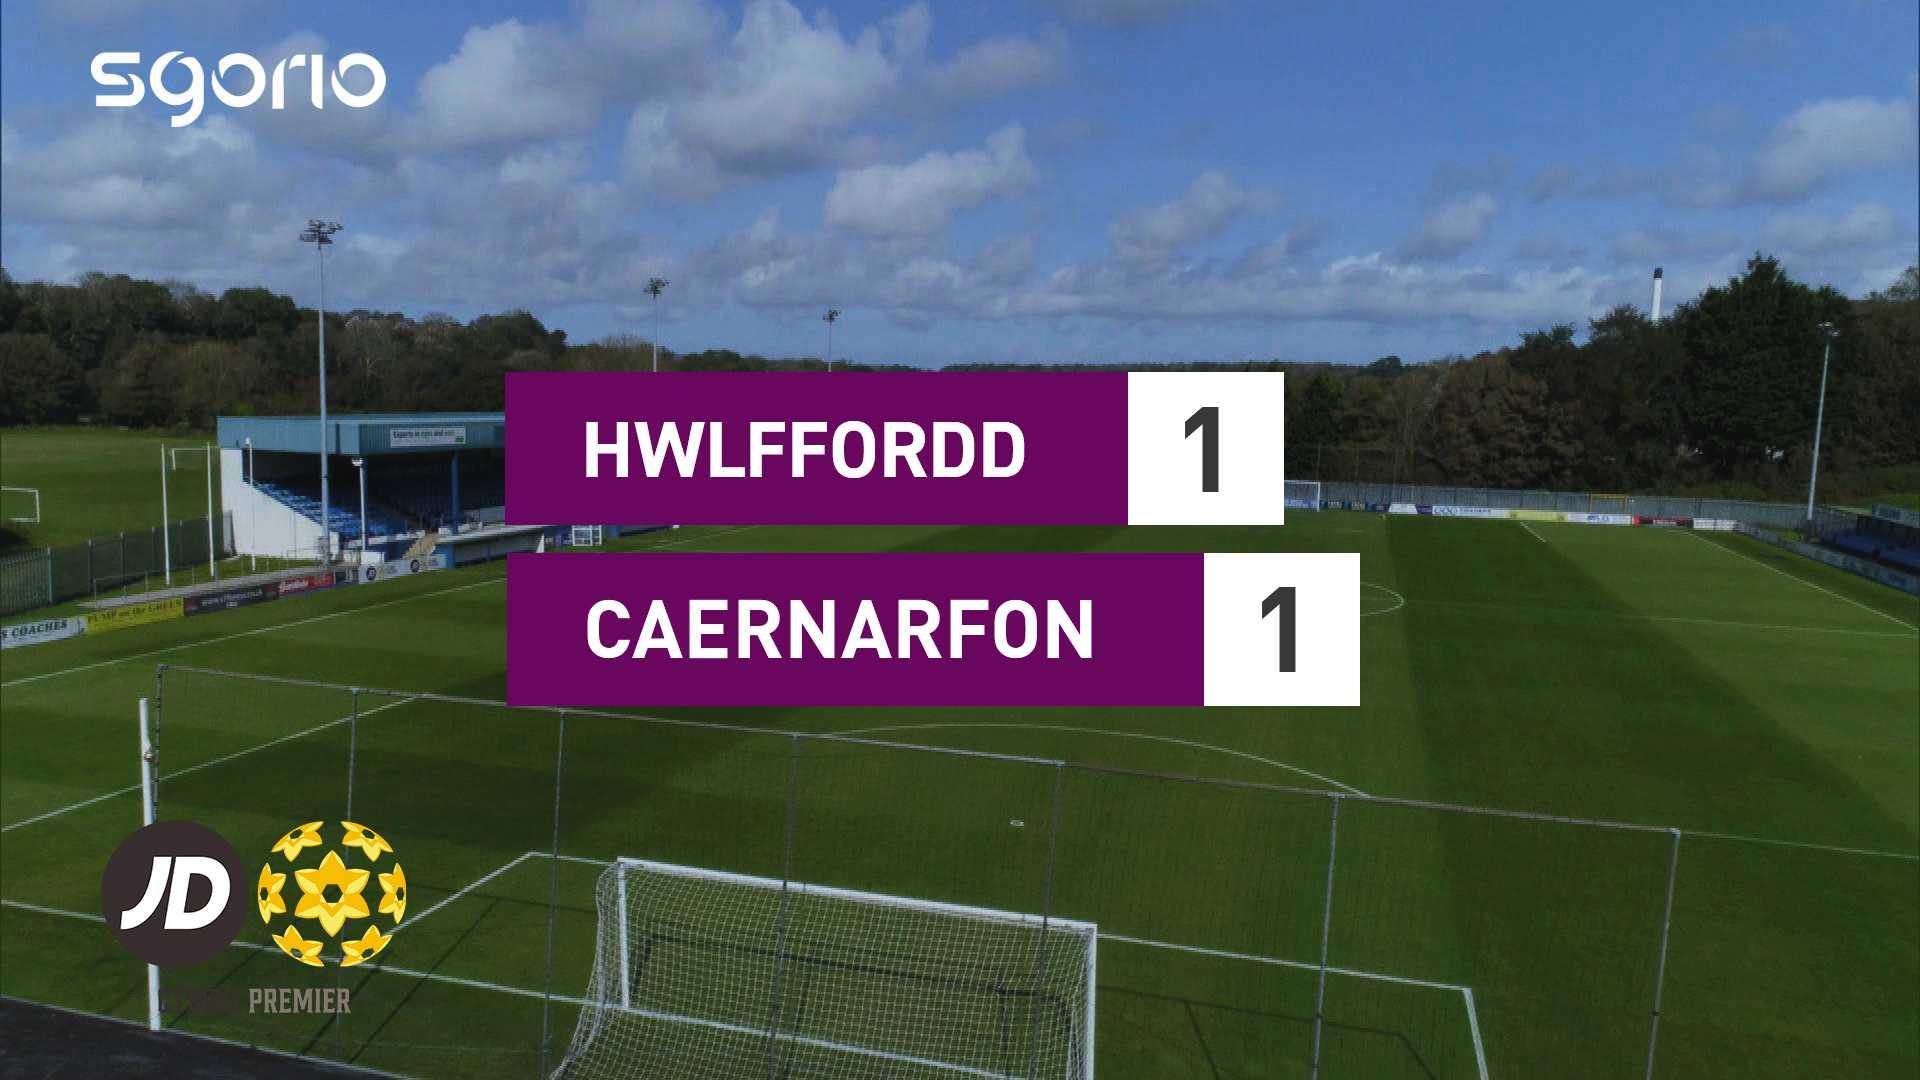 Hwlffordd 1-1 Caernarfon